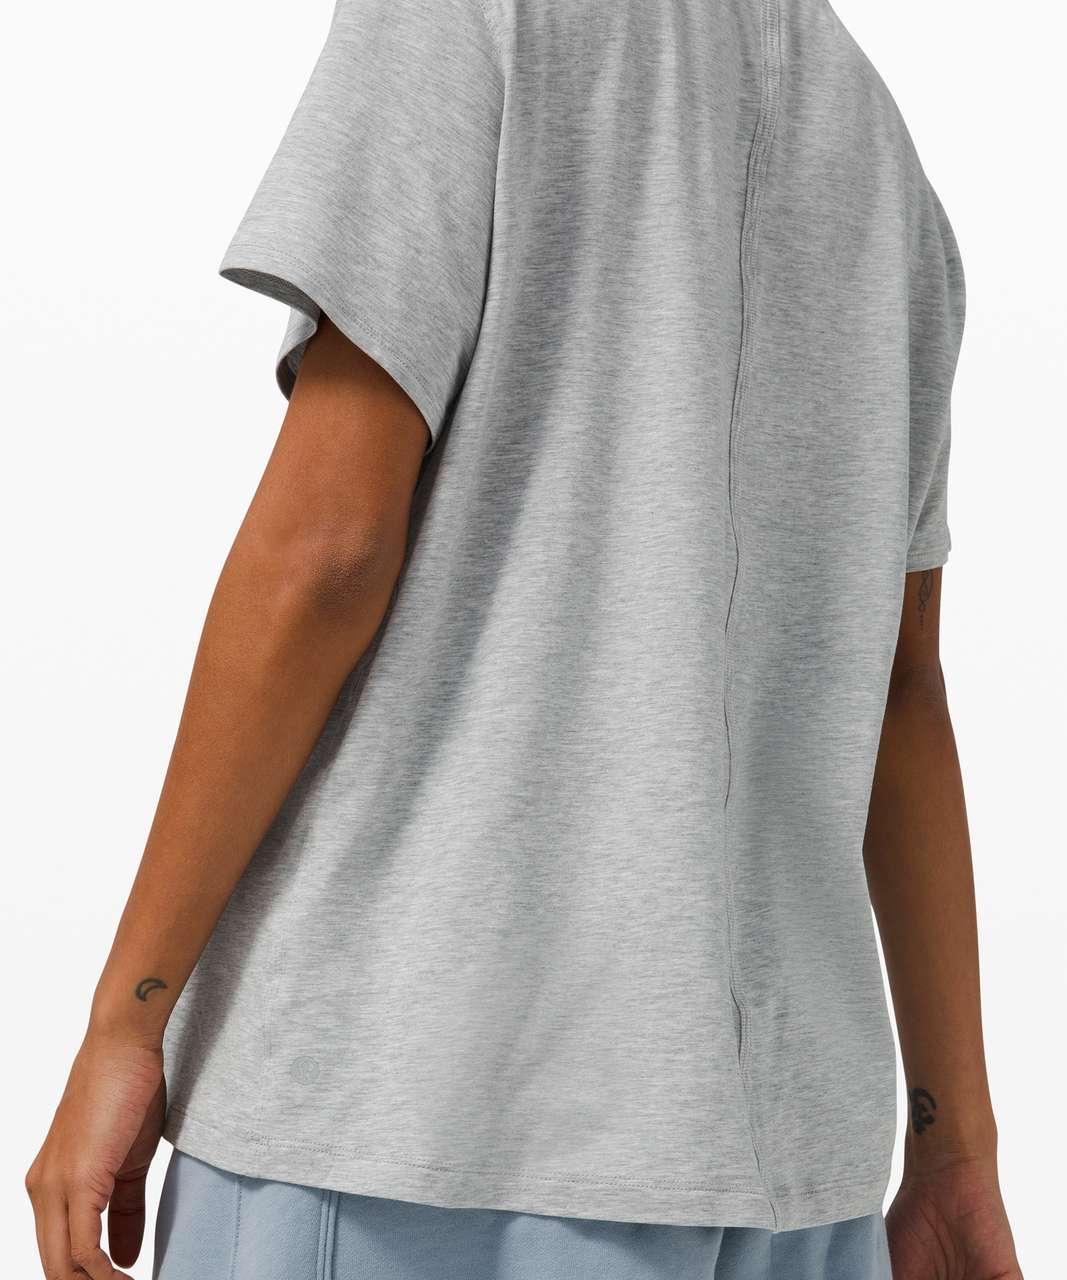 Lululemon All Yours Tee - Heathered Core Light Grey